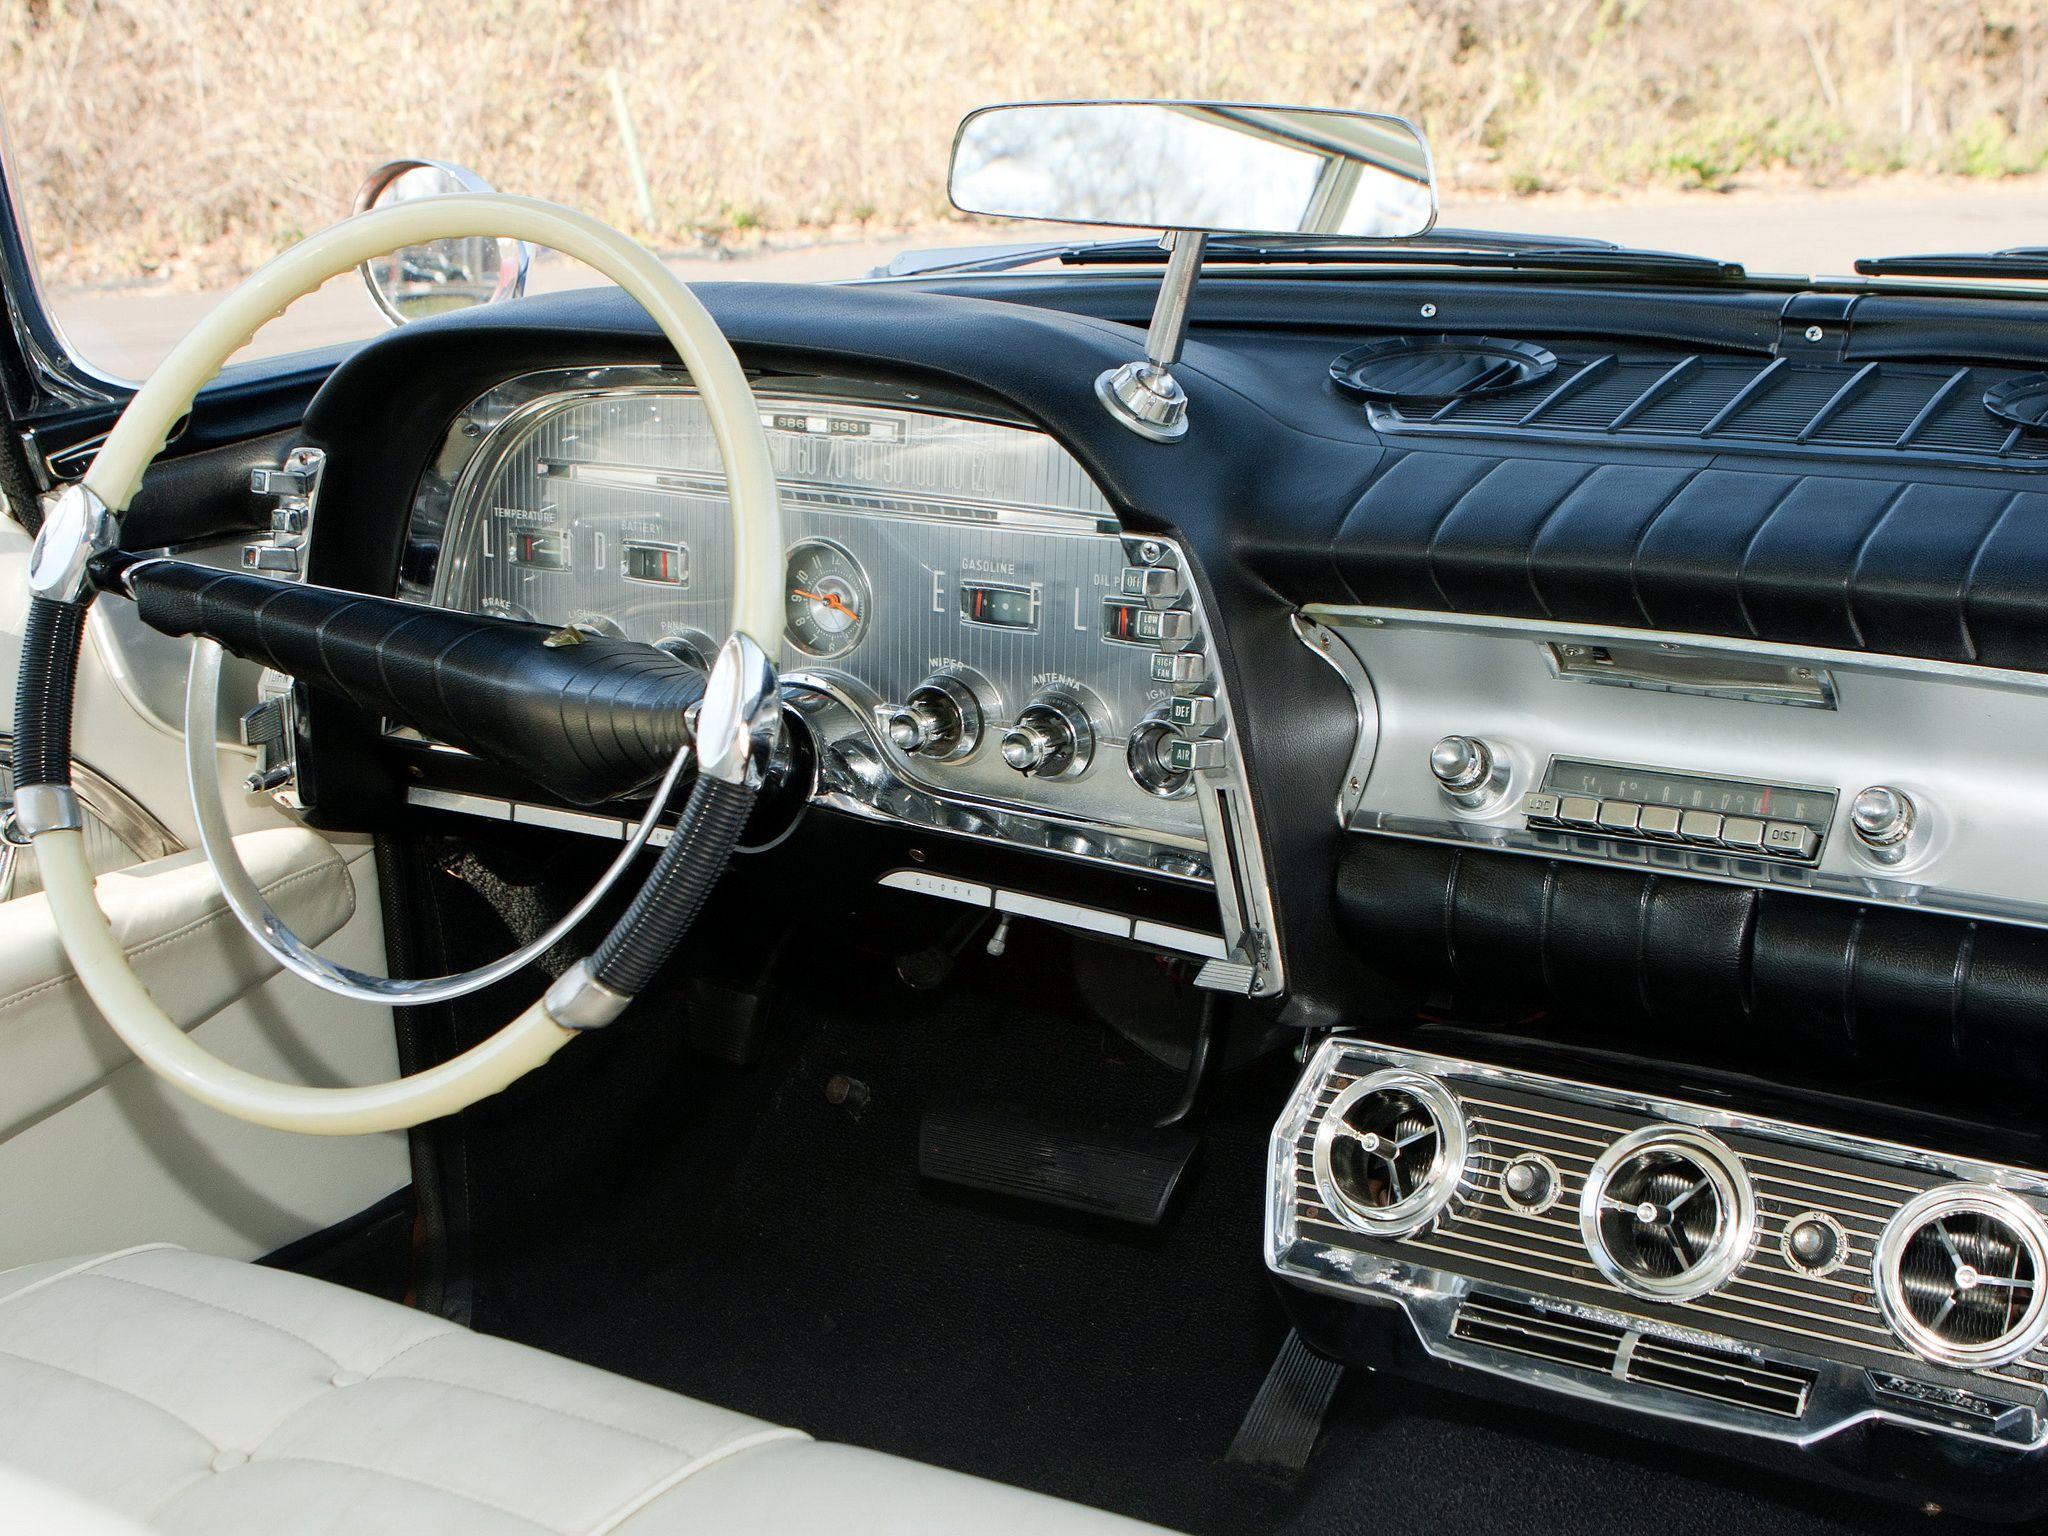 1959 Chrysler Imperial Crown Southampton Hardtop Sedan My1 M634